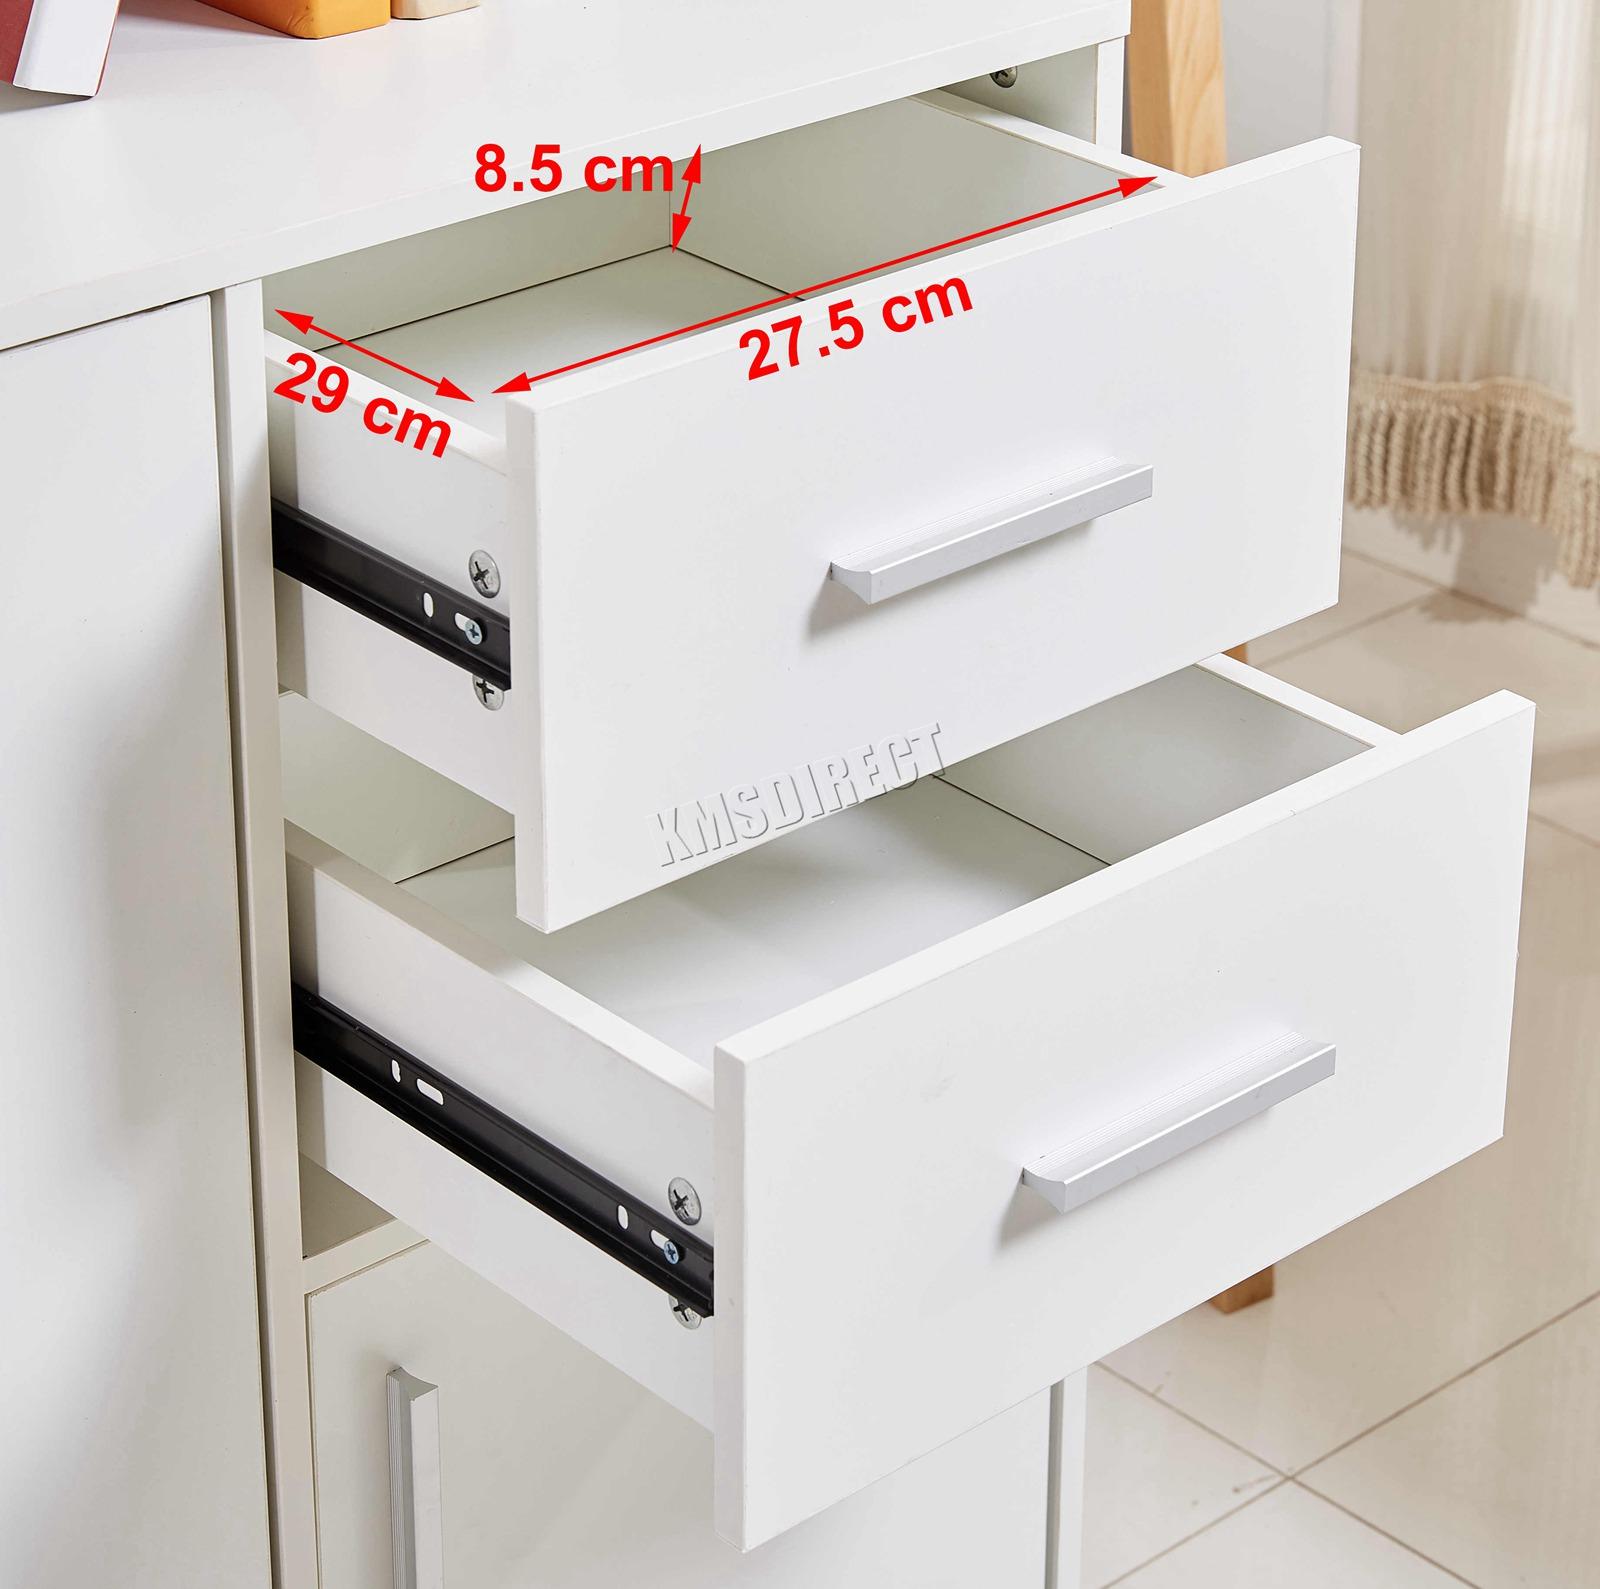 WestWood-Sideboard-Cabinet-Storage-tableware-Kitchen-Cupboard-Unit-PB-SSP01-NEW thumbnail 44